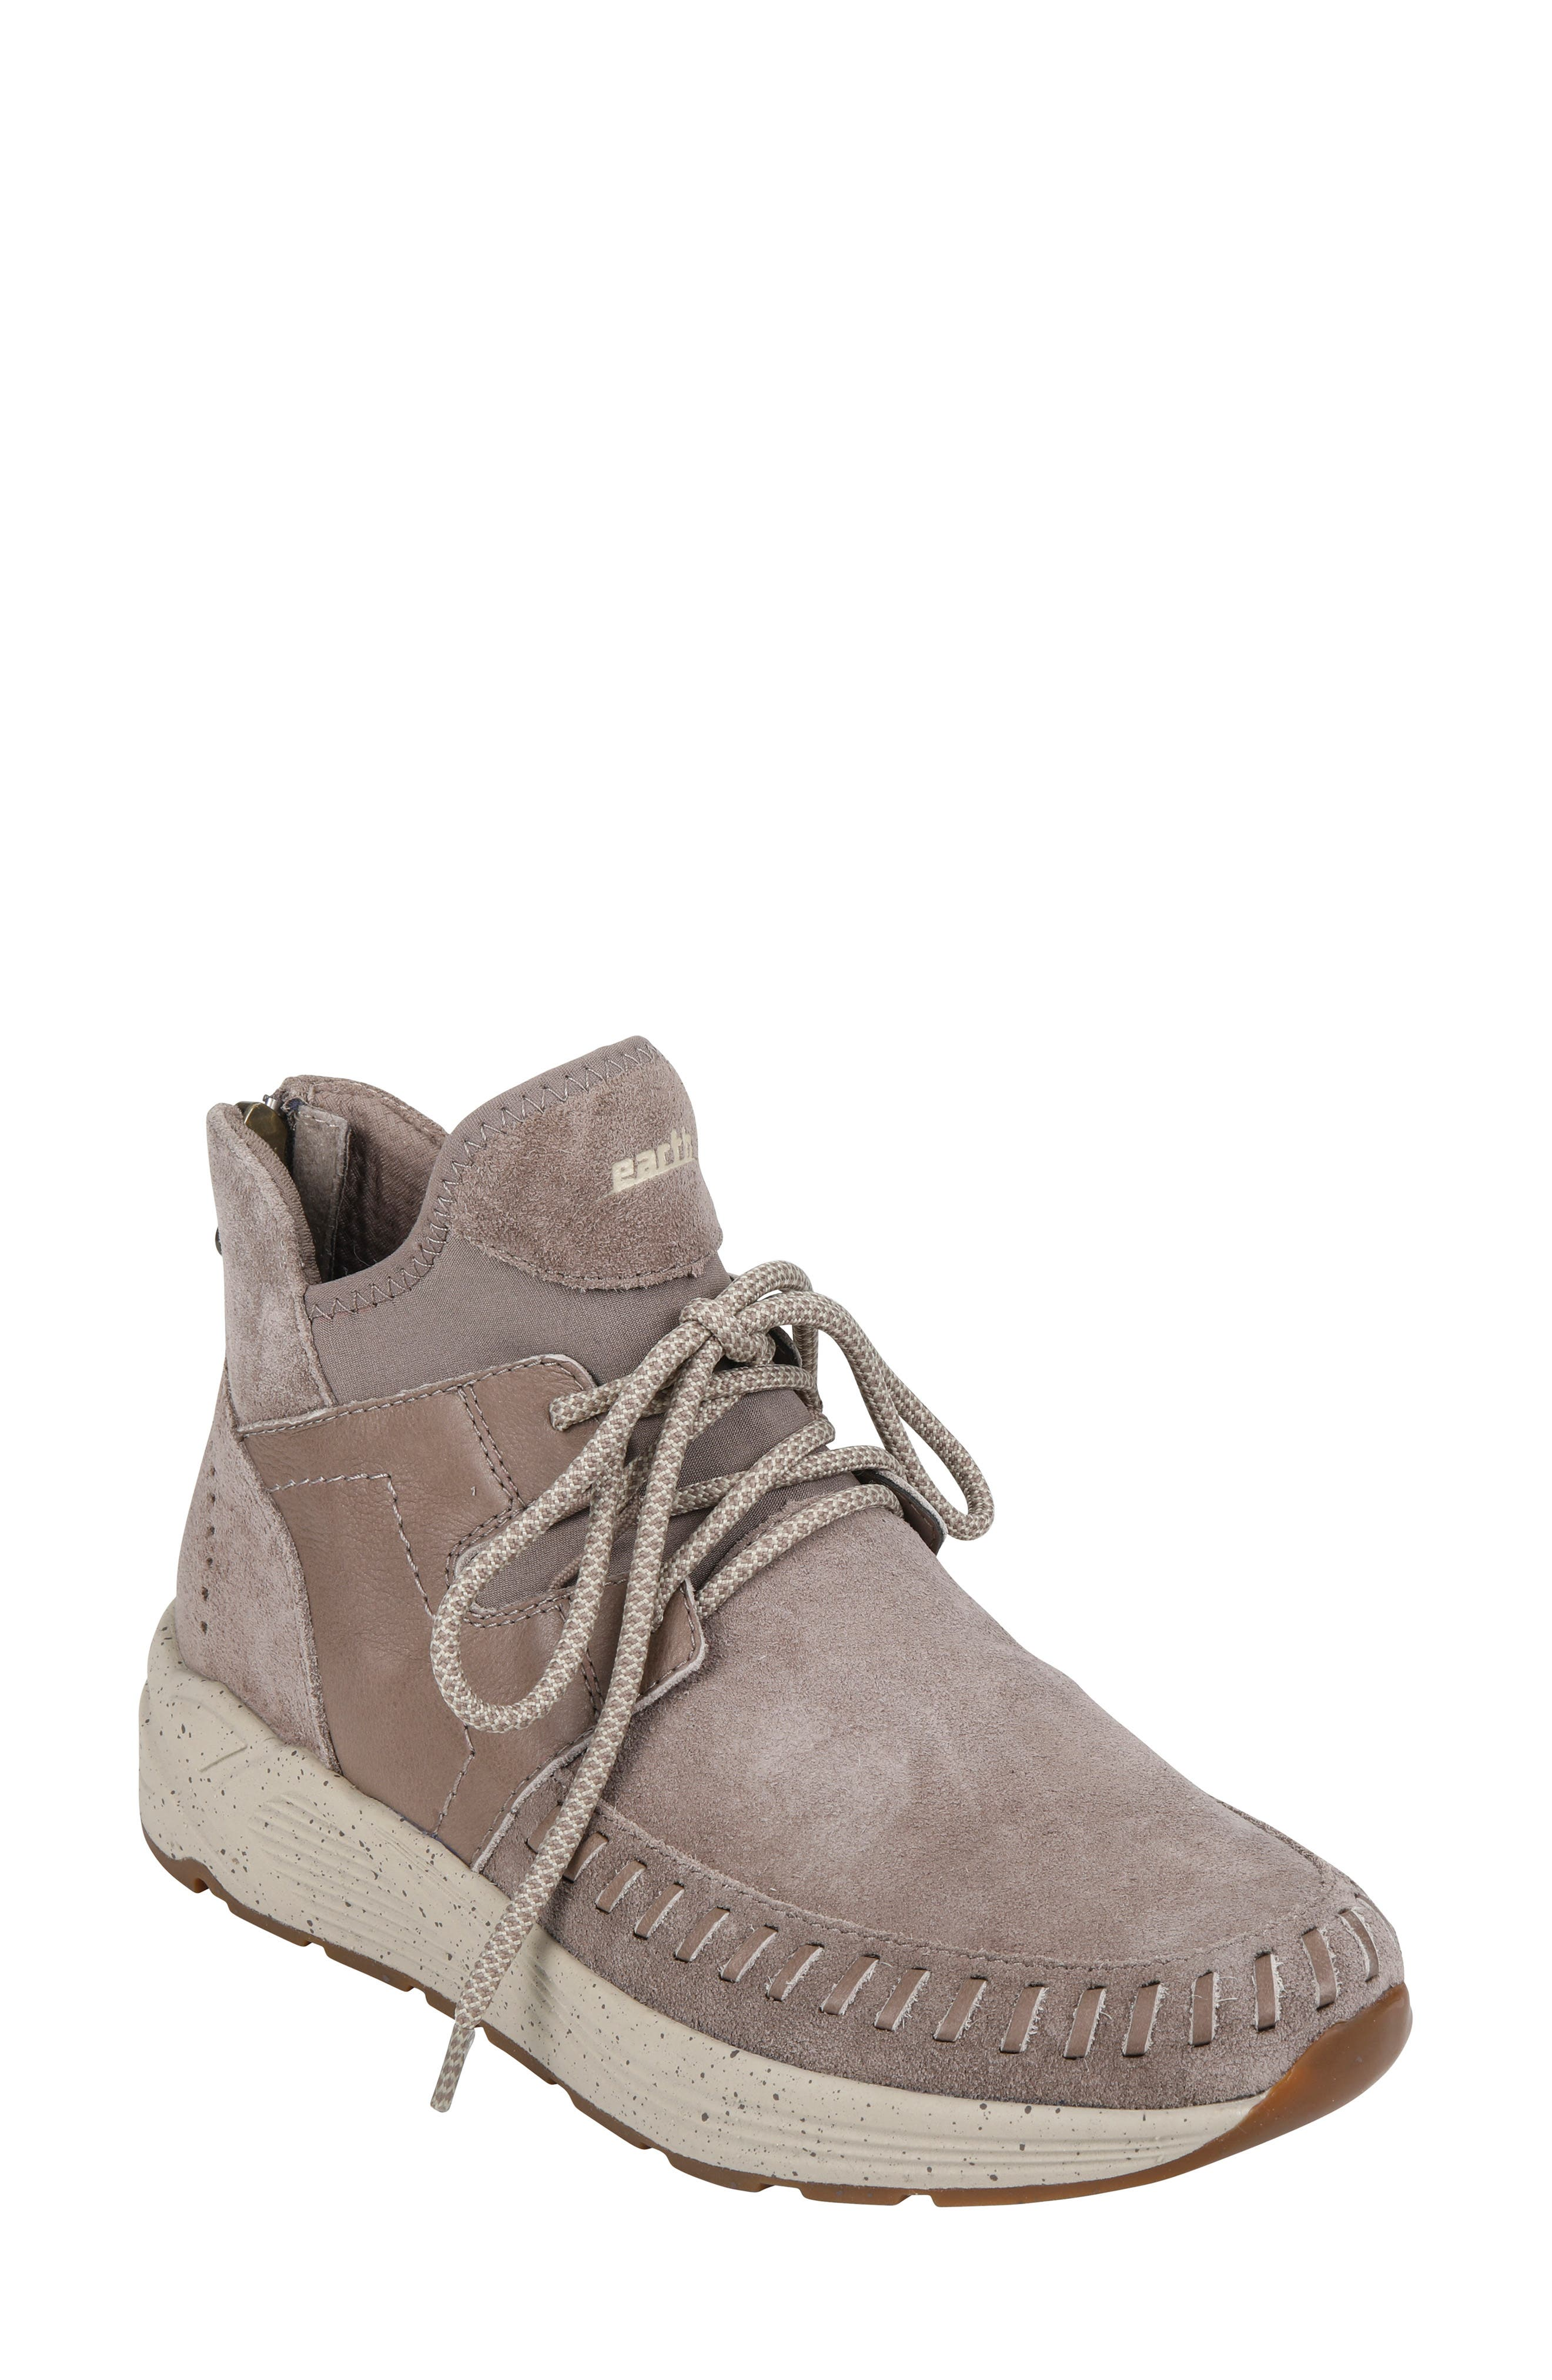 Earth Jaunt Sneaker, Beige